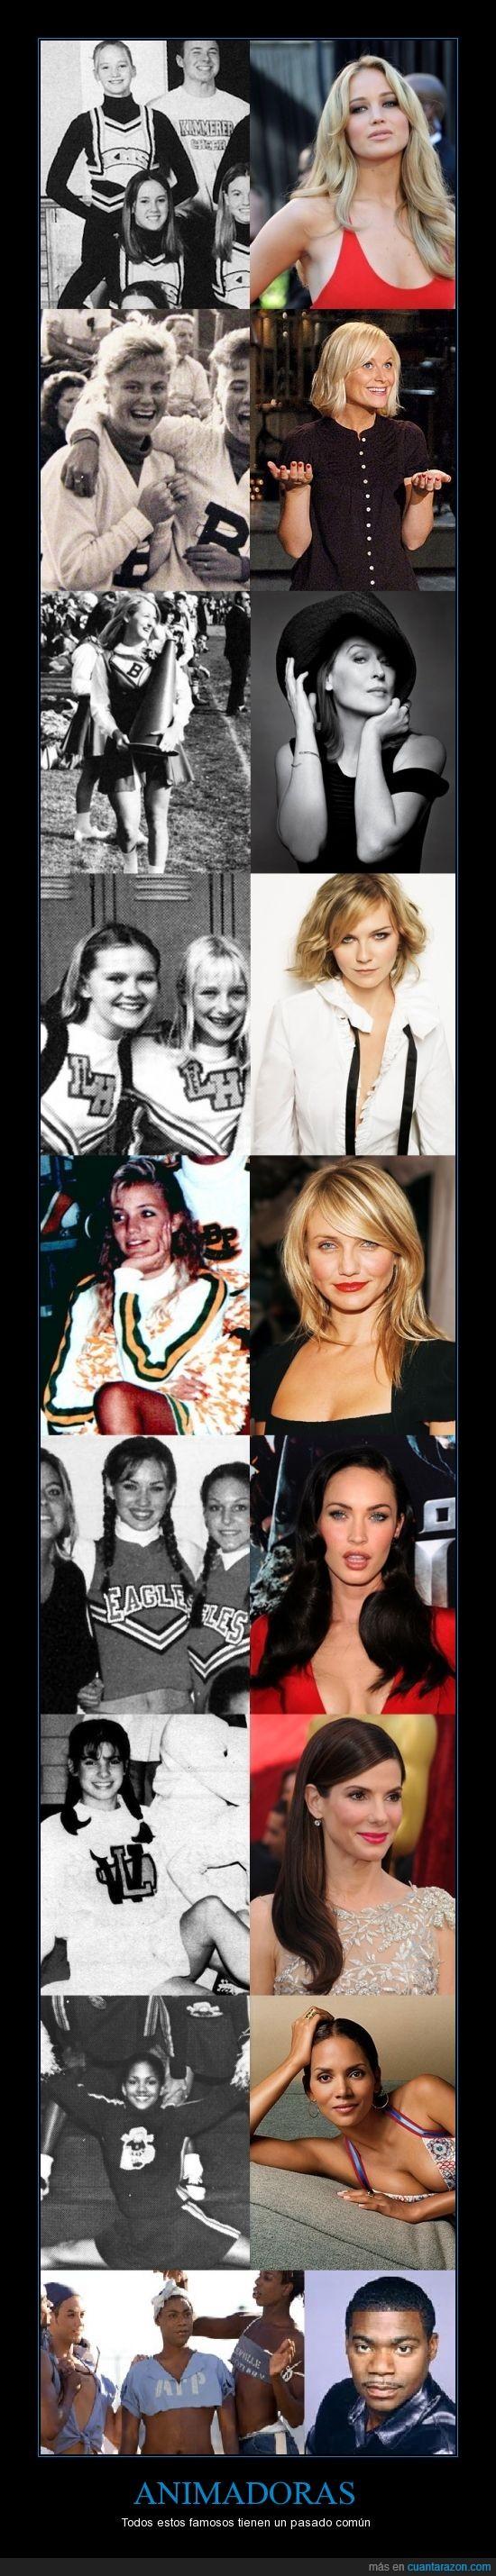 Amy Poehler,animadoras,Cameron Diaz,celebridades,Halle Berry,Jennifer Lawrence,Kirsten Dunst,Megan Fox,Meryl Streep,Sandra Bullock,Tracy Morgan